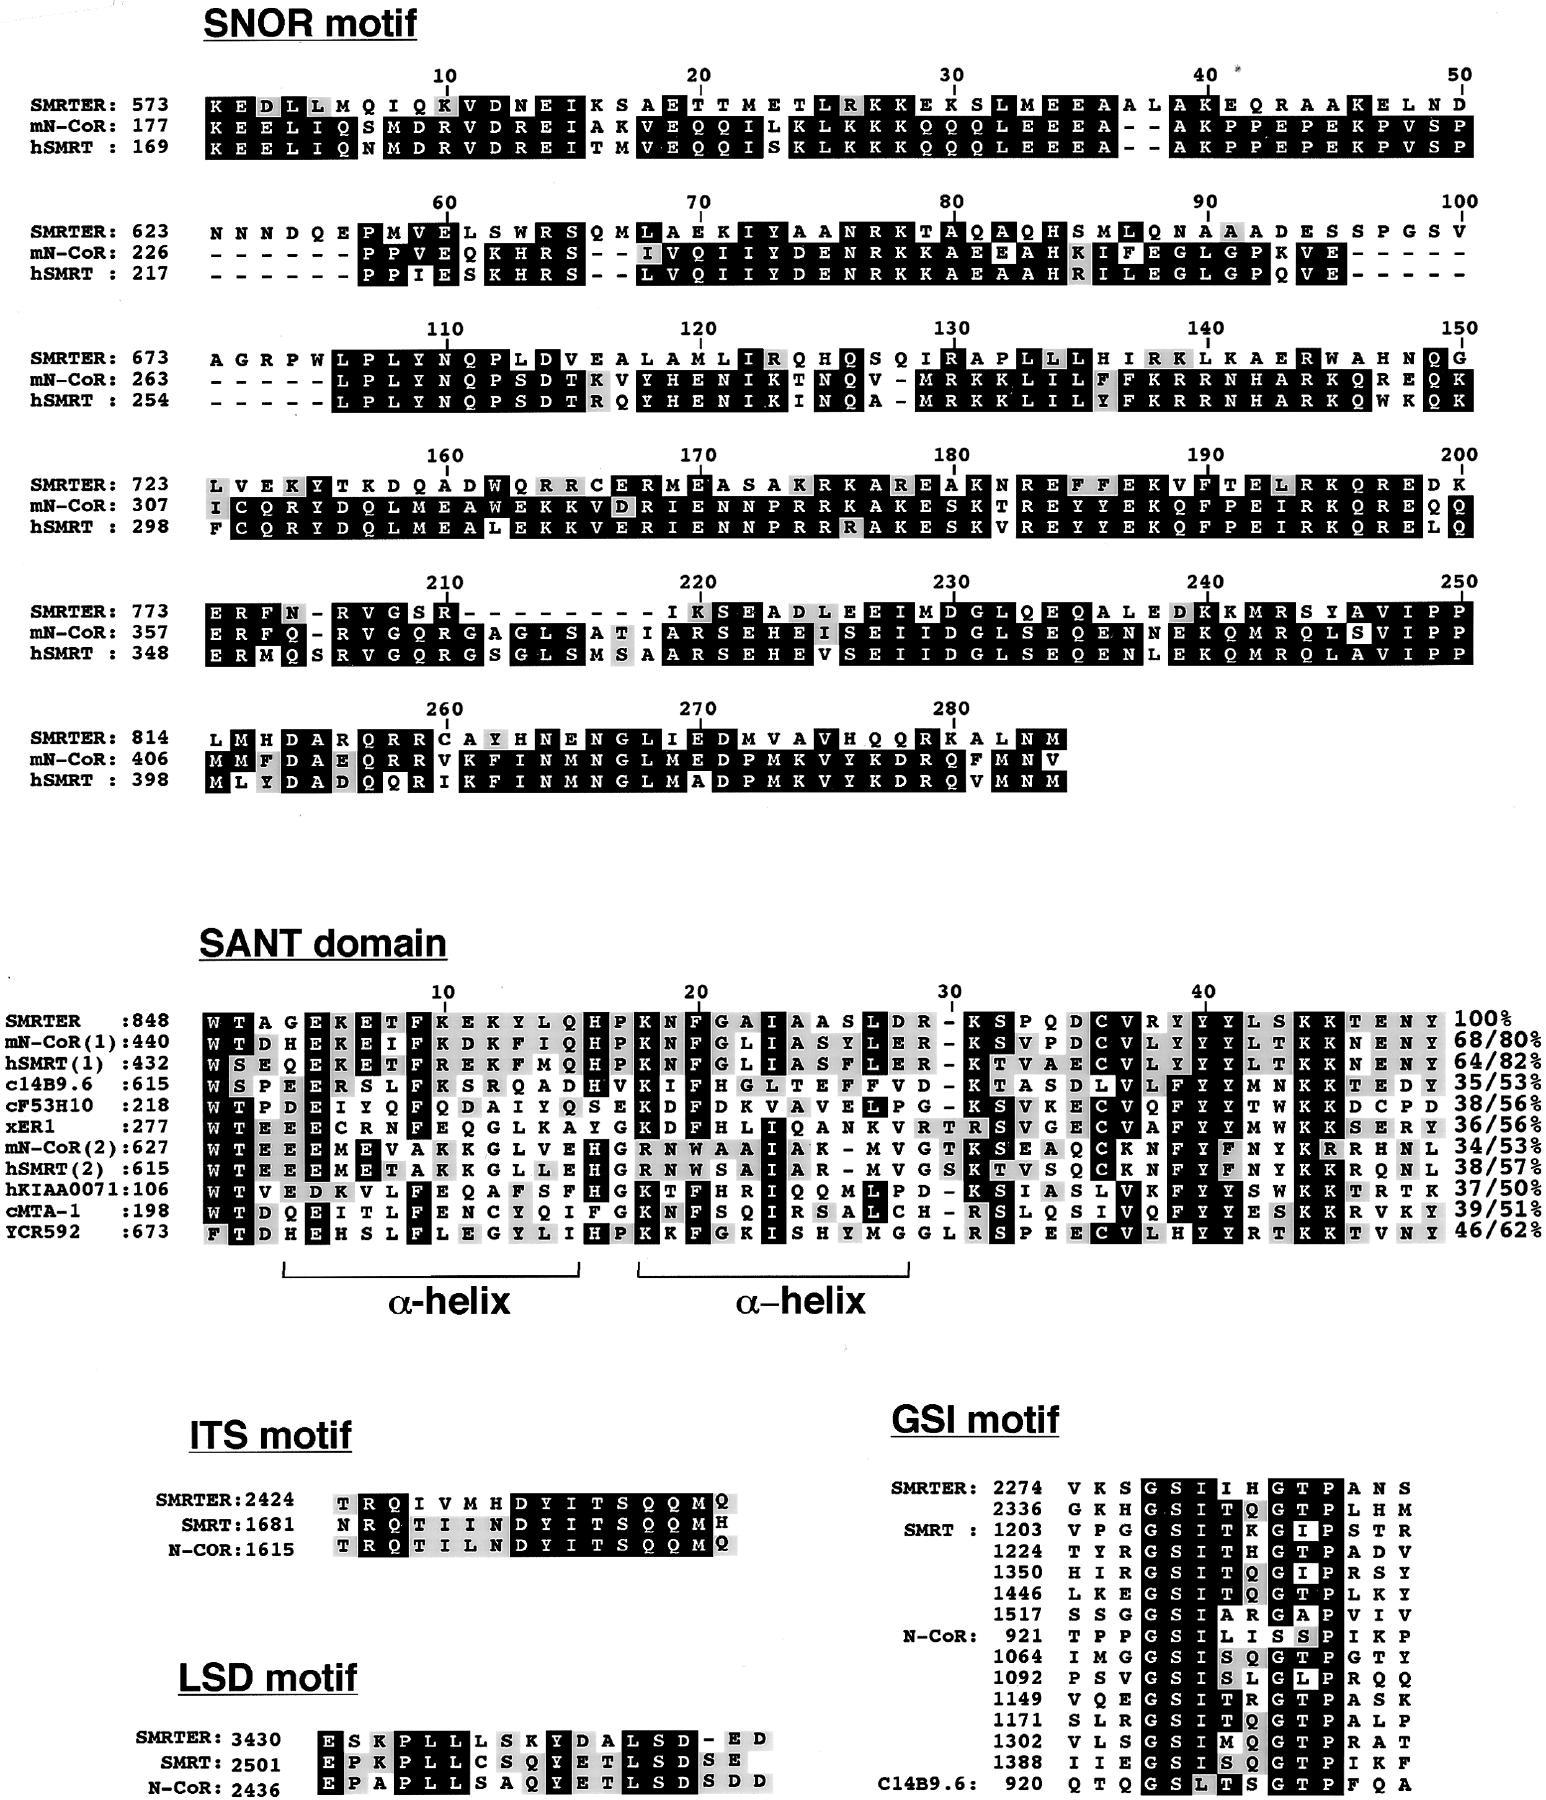 Smrter A Drosophila Nuclear Receptor Coregulator Reveals